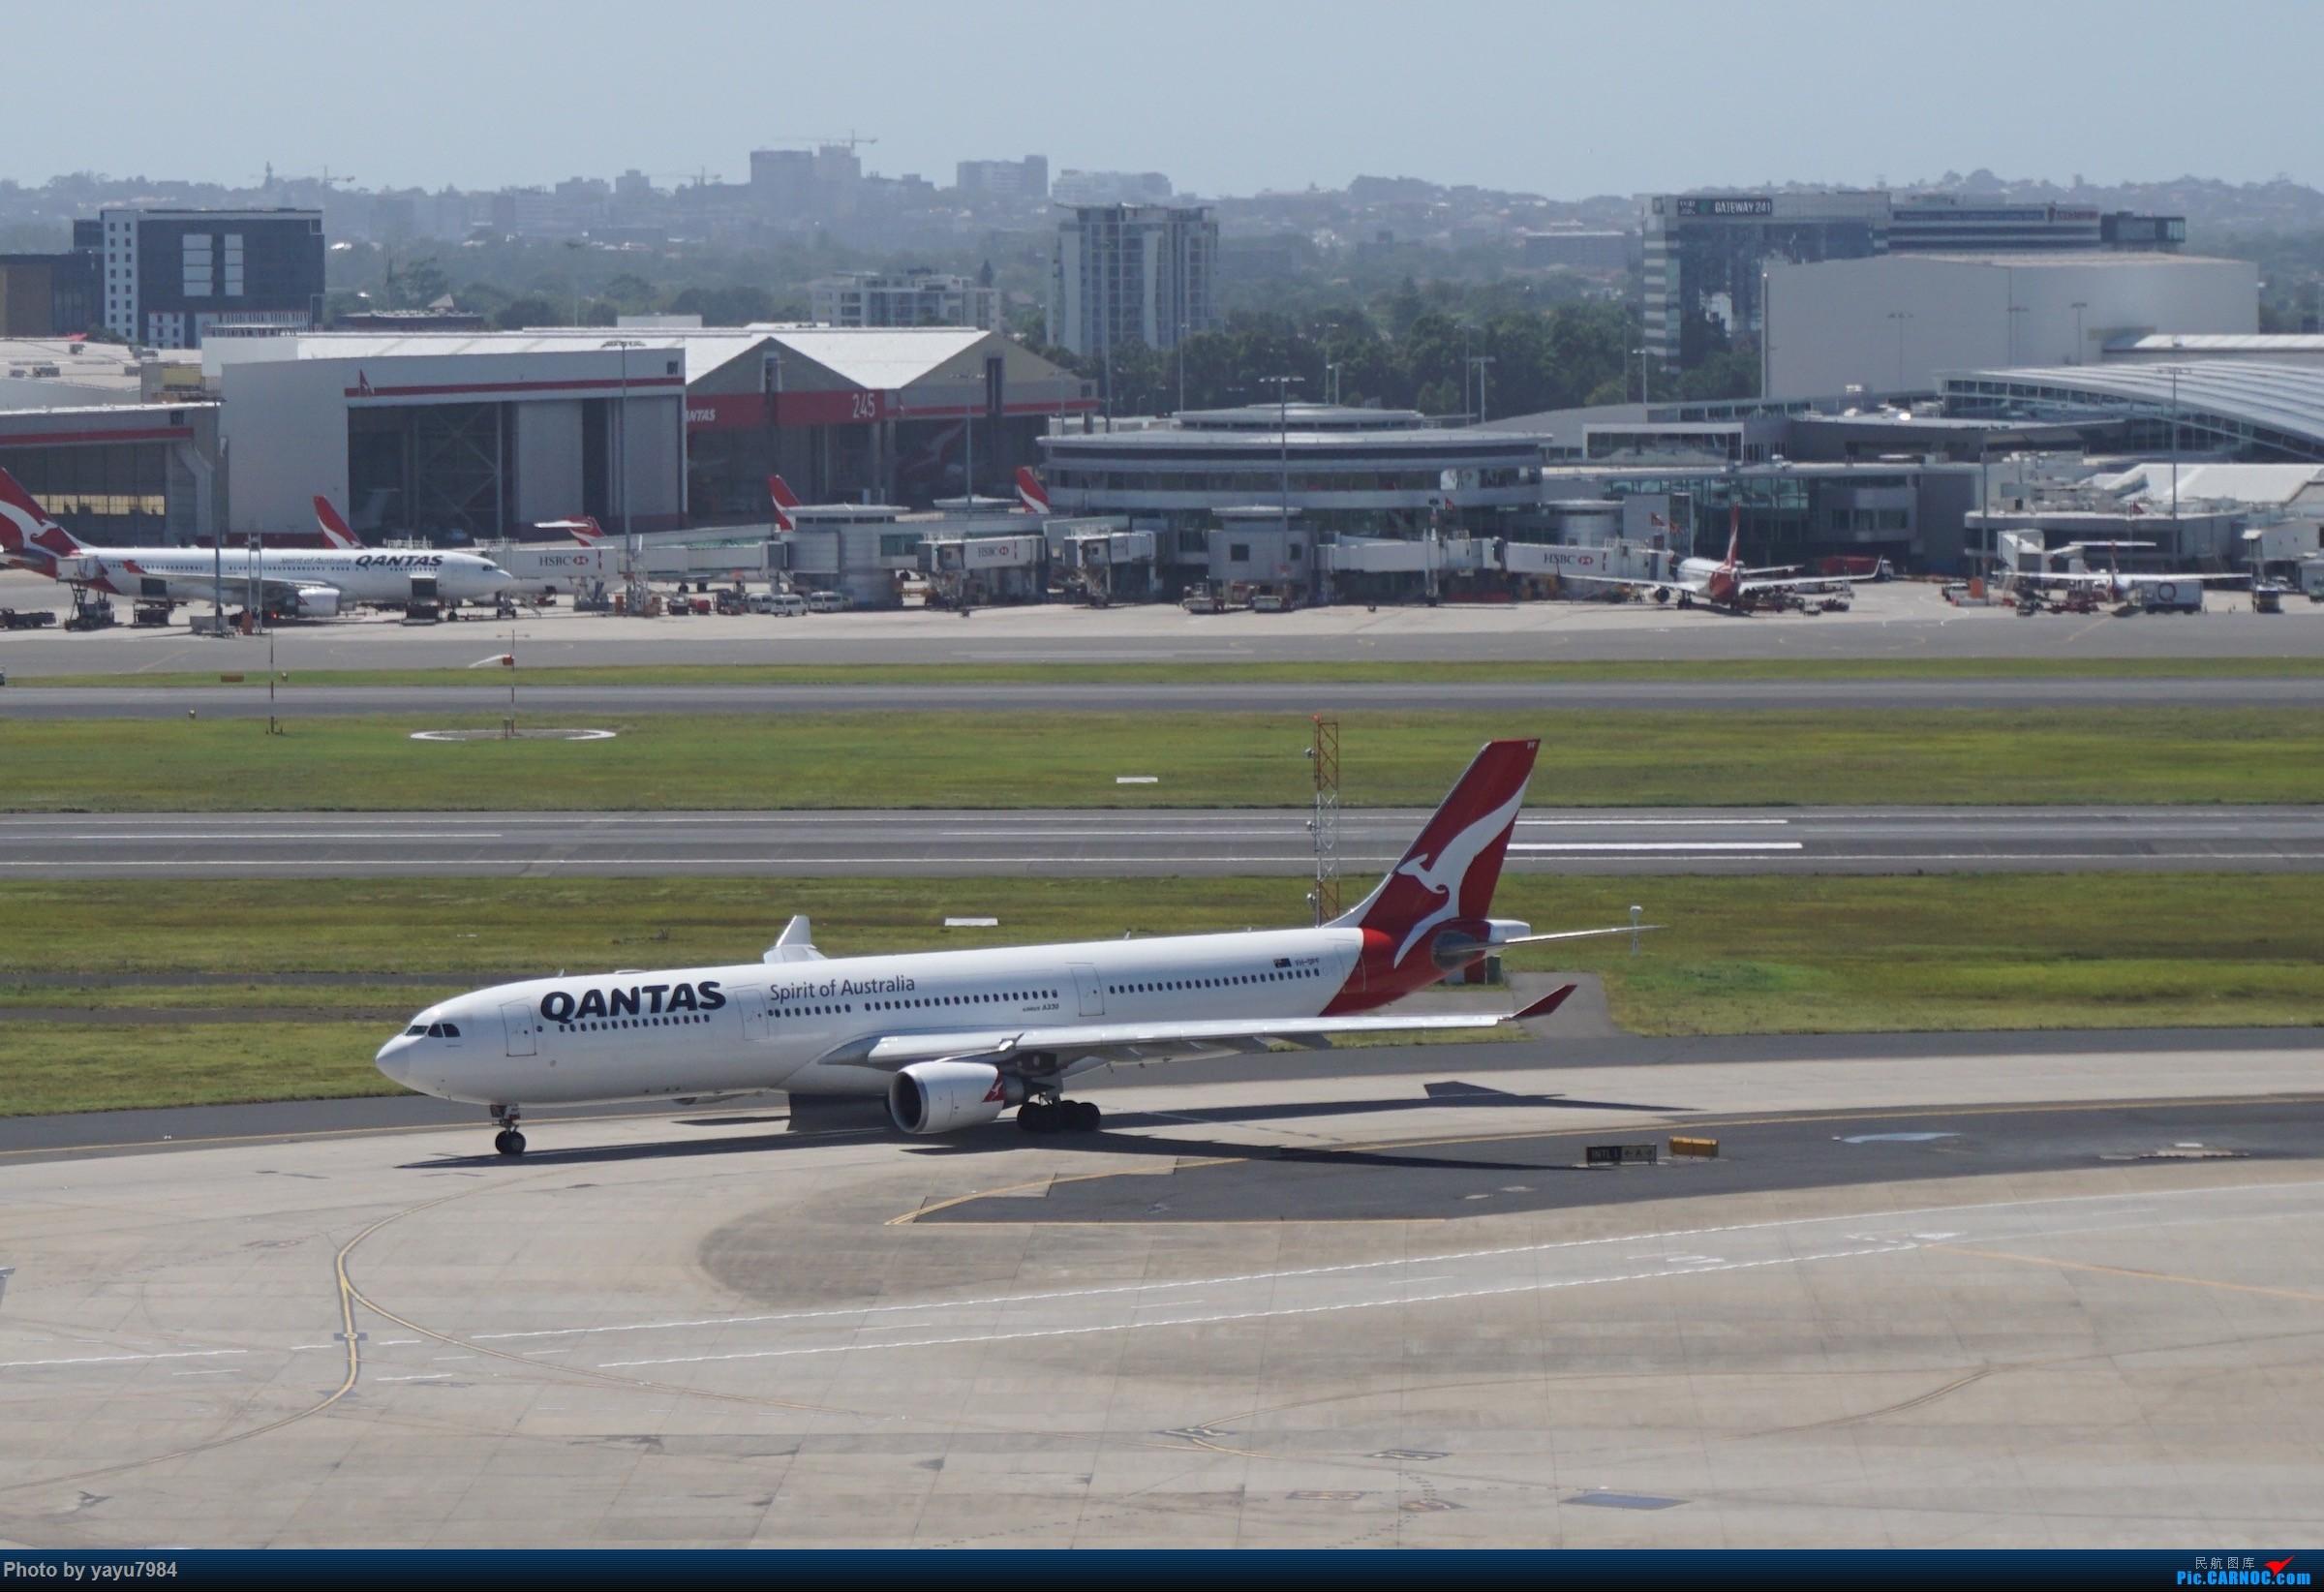 Re:[原创][SYD] 停车楼顶看宽体 AIRBUS A330-300 VH-QPF 澳大利亚悉尼金斯福德·史密斯机场